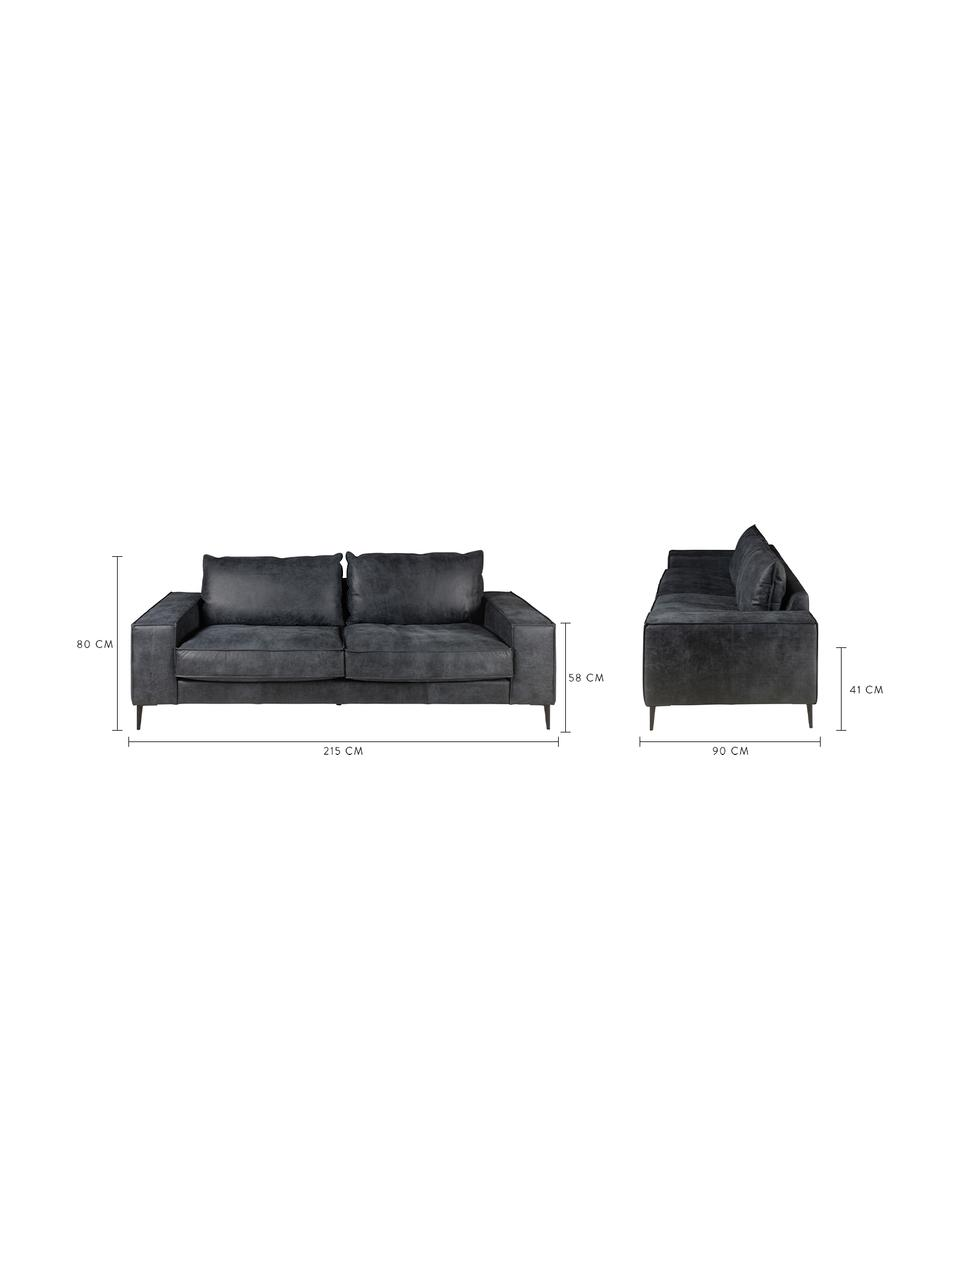 Leren bank Brett (3-zits) in zwart-grijs in industrieel design, Bekleding: glad runderleer, Frame: gelakt aluminium, Leer zwart-grijs, B 215 x D 90 cm